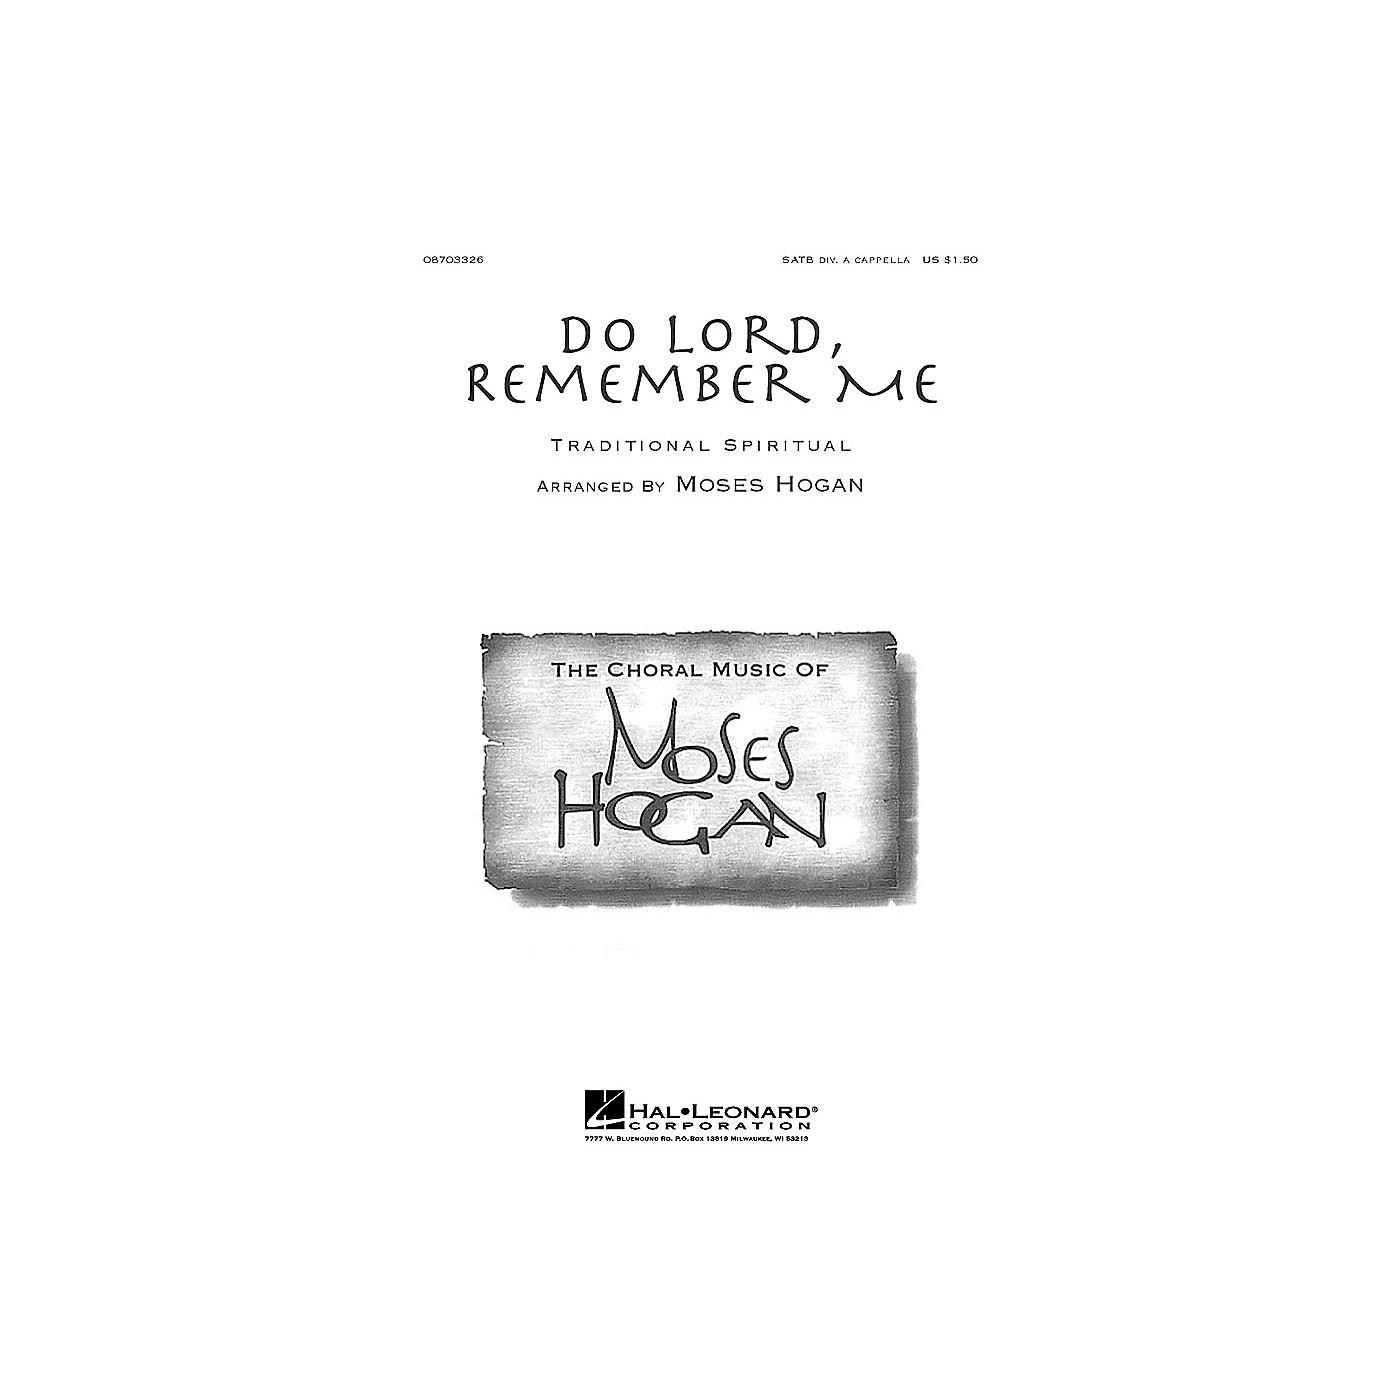 Hal Leonard Do Lord, Remember Me SATB DV A Cappella arranged by Moses Hogan thumbnail